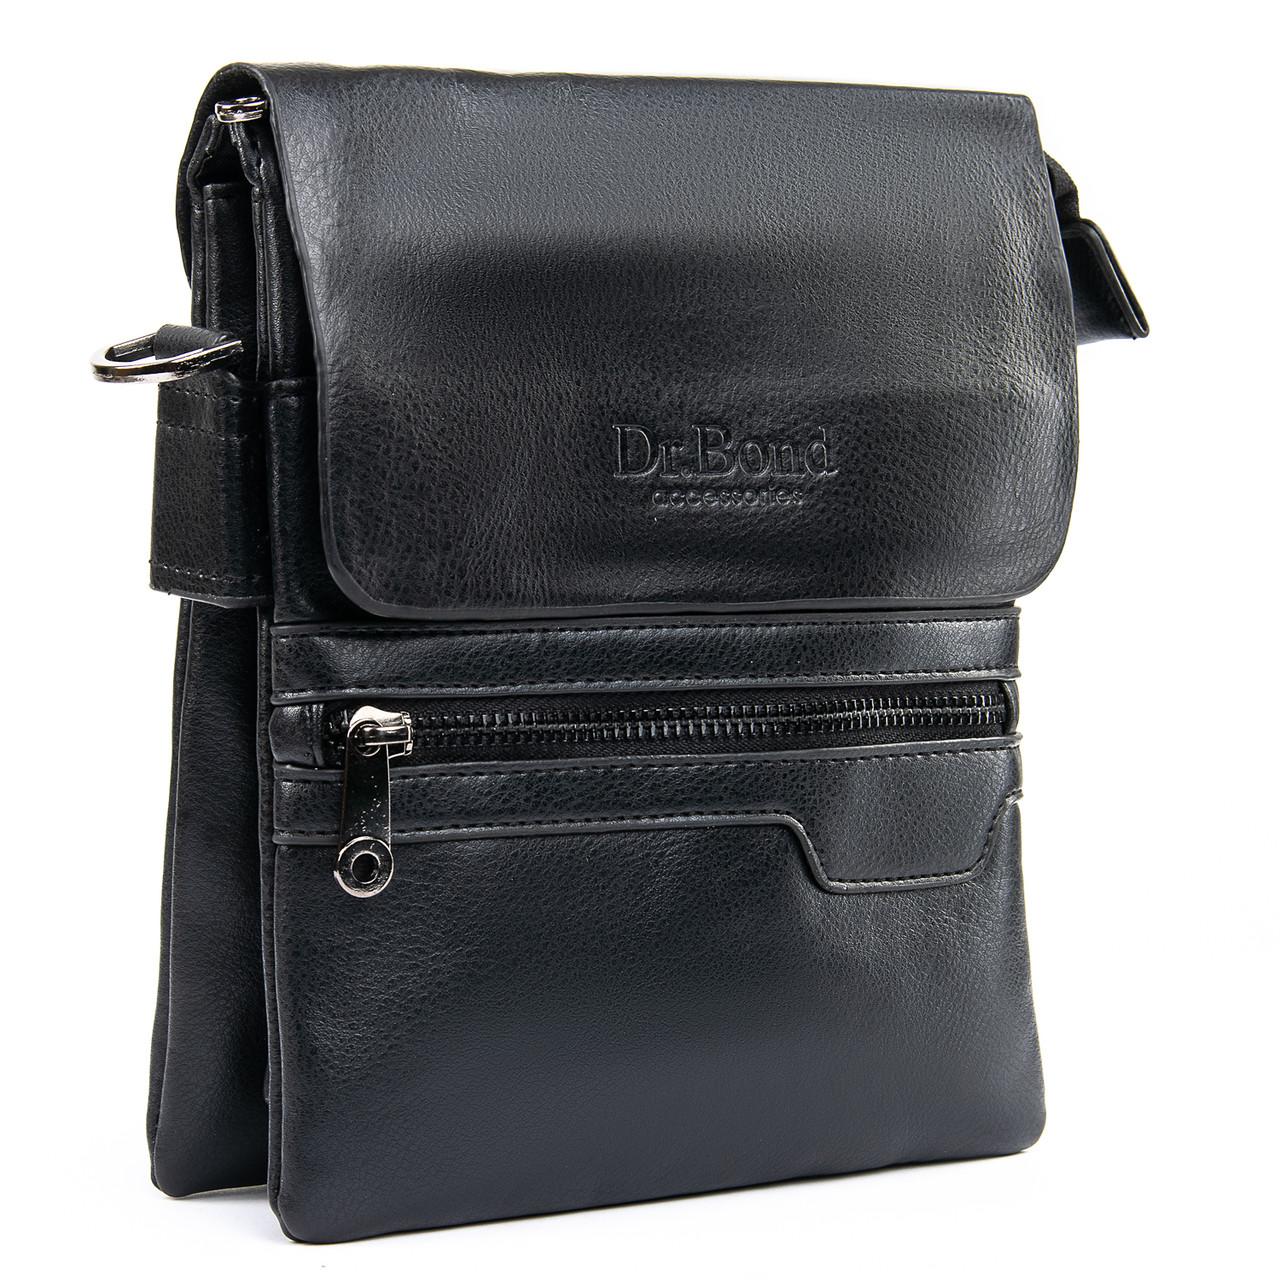 Чоловіча сумка-планшет штучна-шкіра чорна DR. BOND GL 303-2 чорна